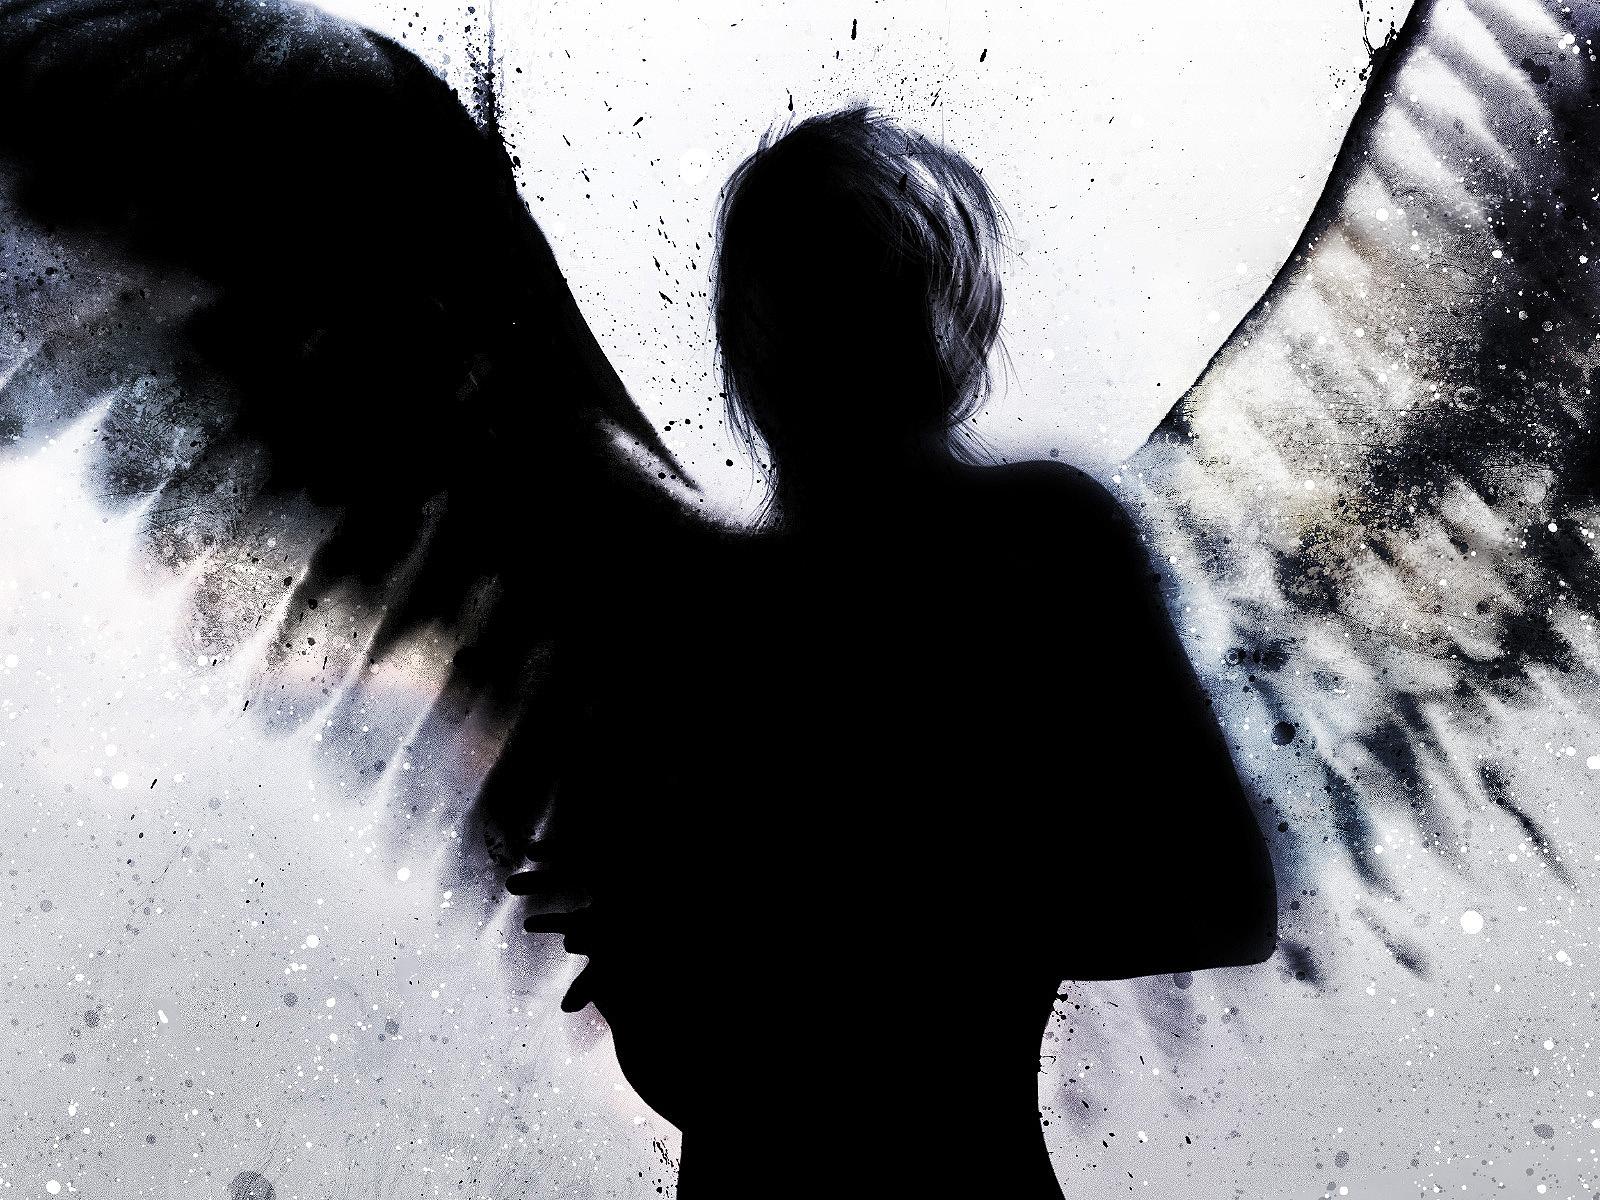 Dark Angels Wallpaper HD Download 1600x1200